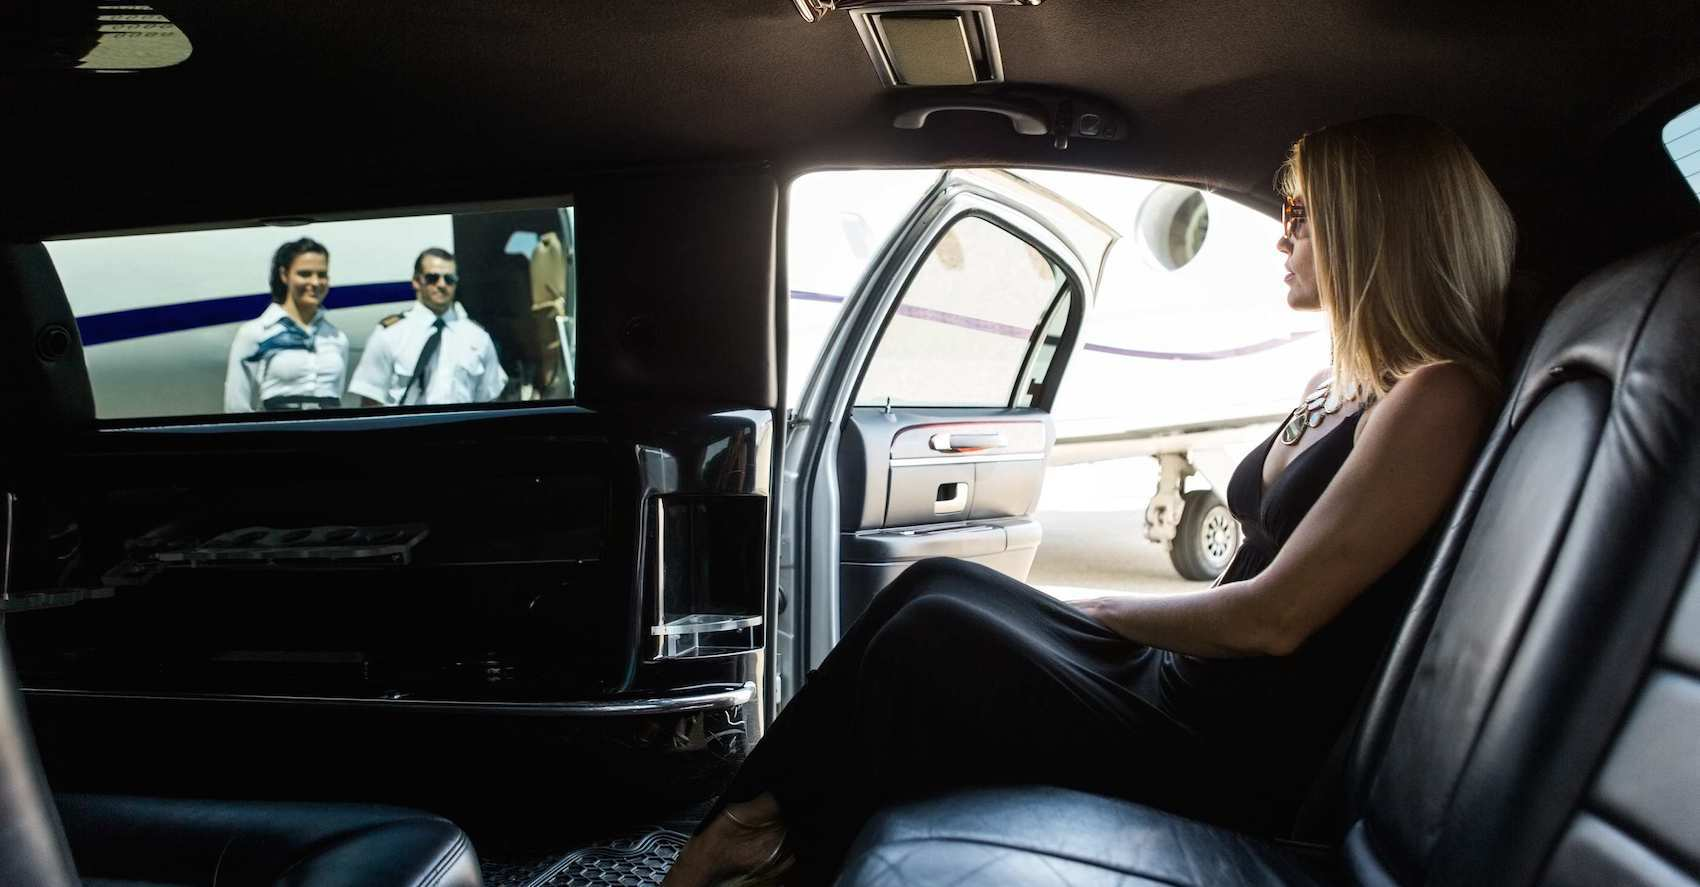 LAX limo service